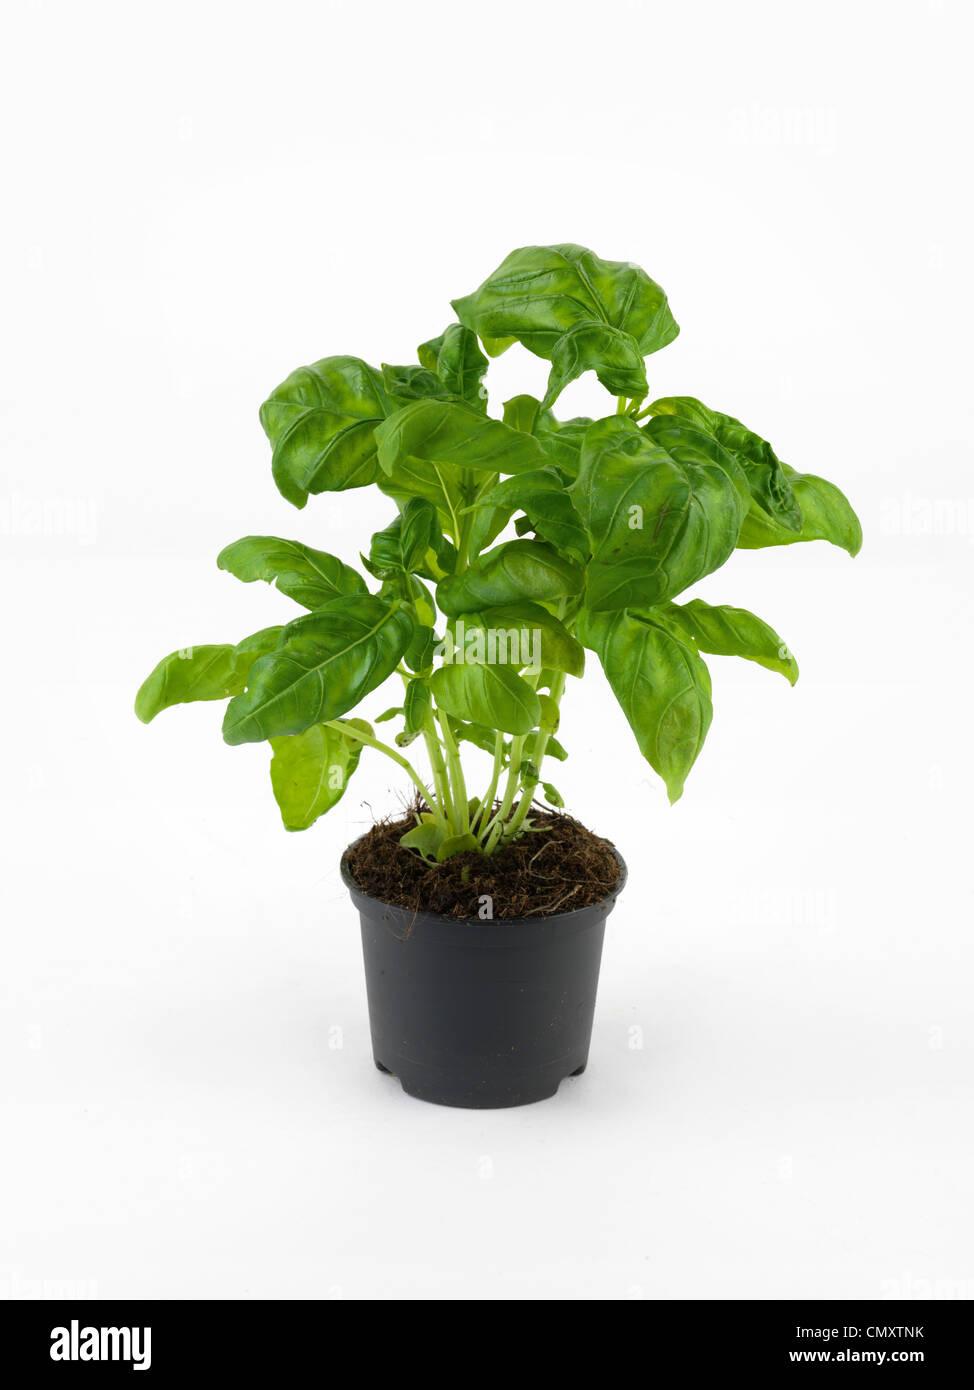 Basil, Basil plant - Stock Image